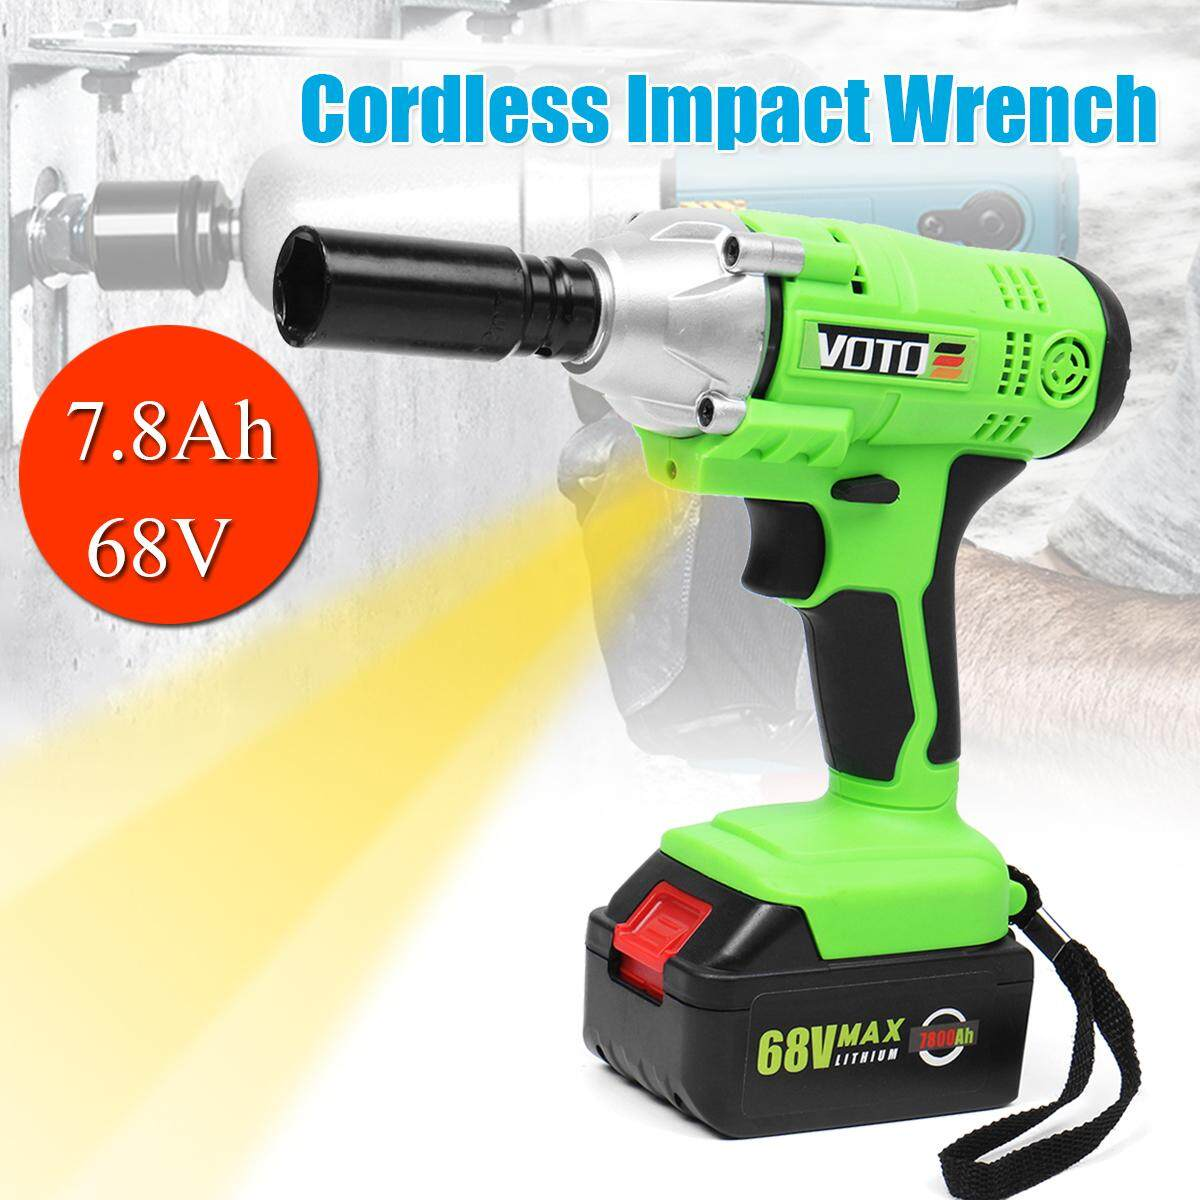 68V 7.8Ah Li-ion Battery Cordless Impact Wrench High Torque 280N.m LED Light EU Plug